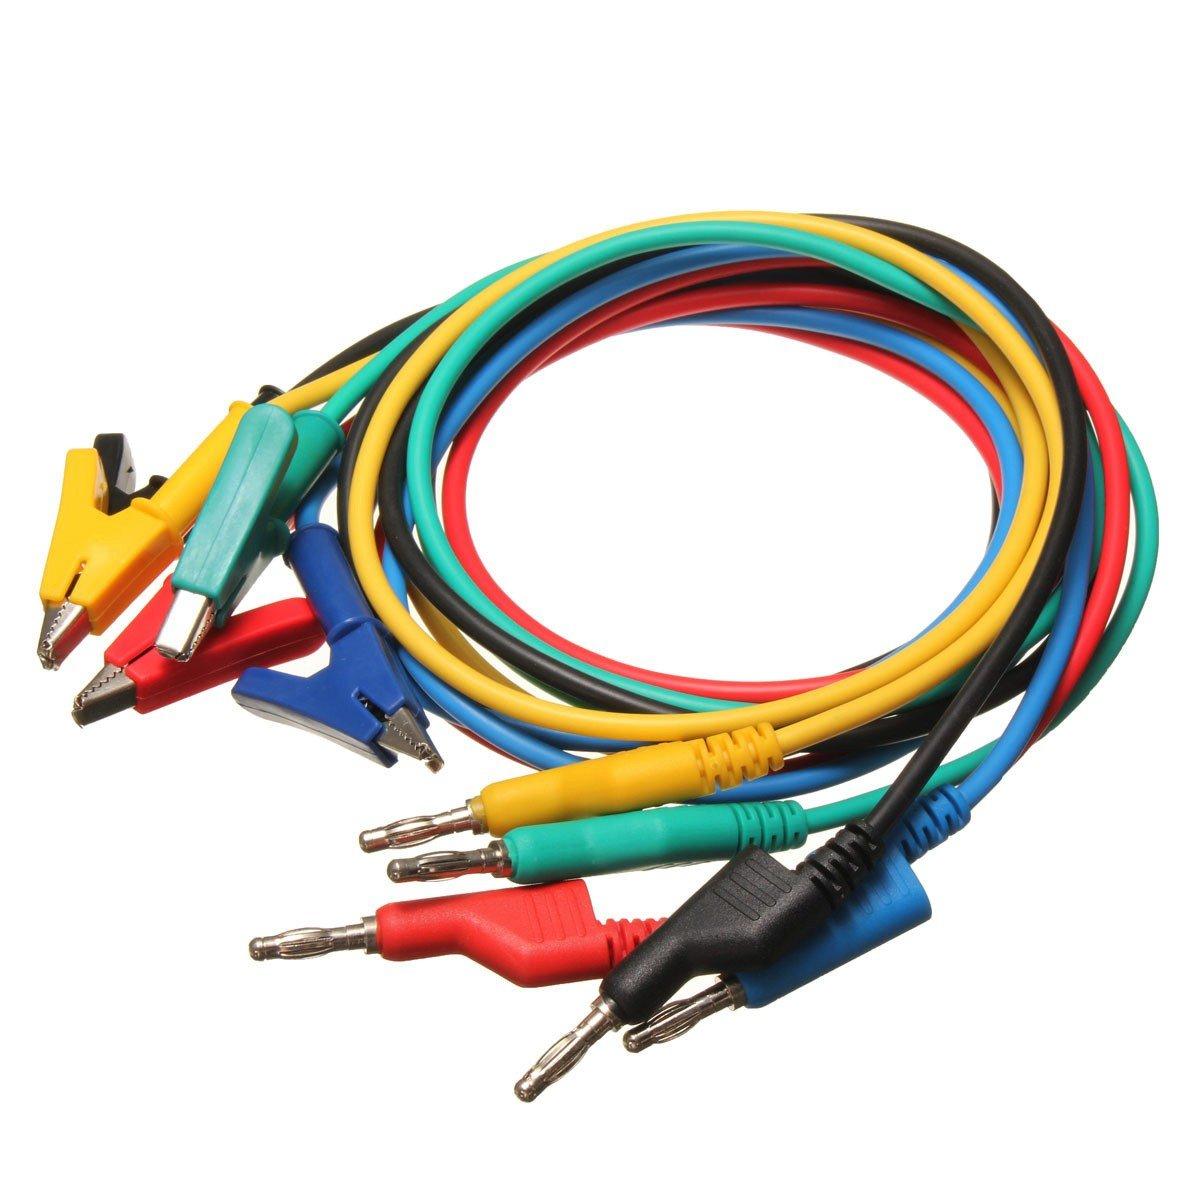 Kabel - Elektroinstallation: Baumarkt : Amazon.de